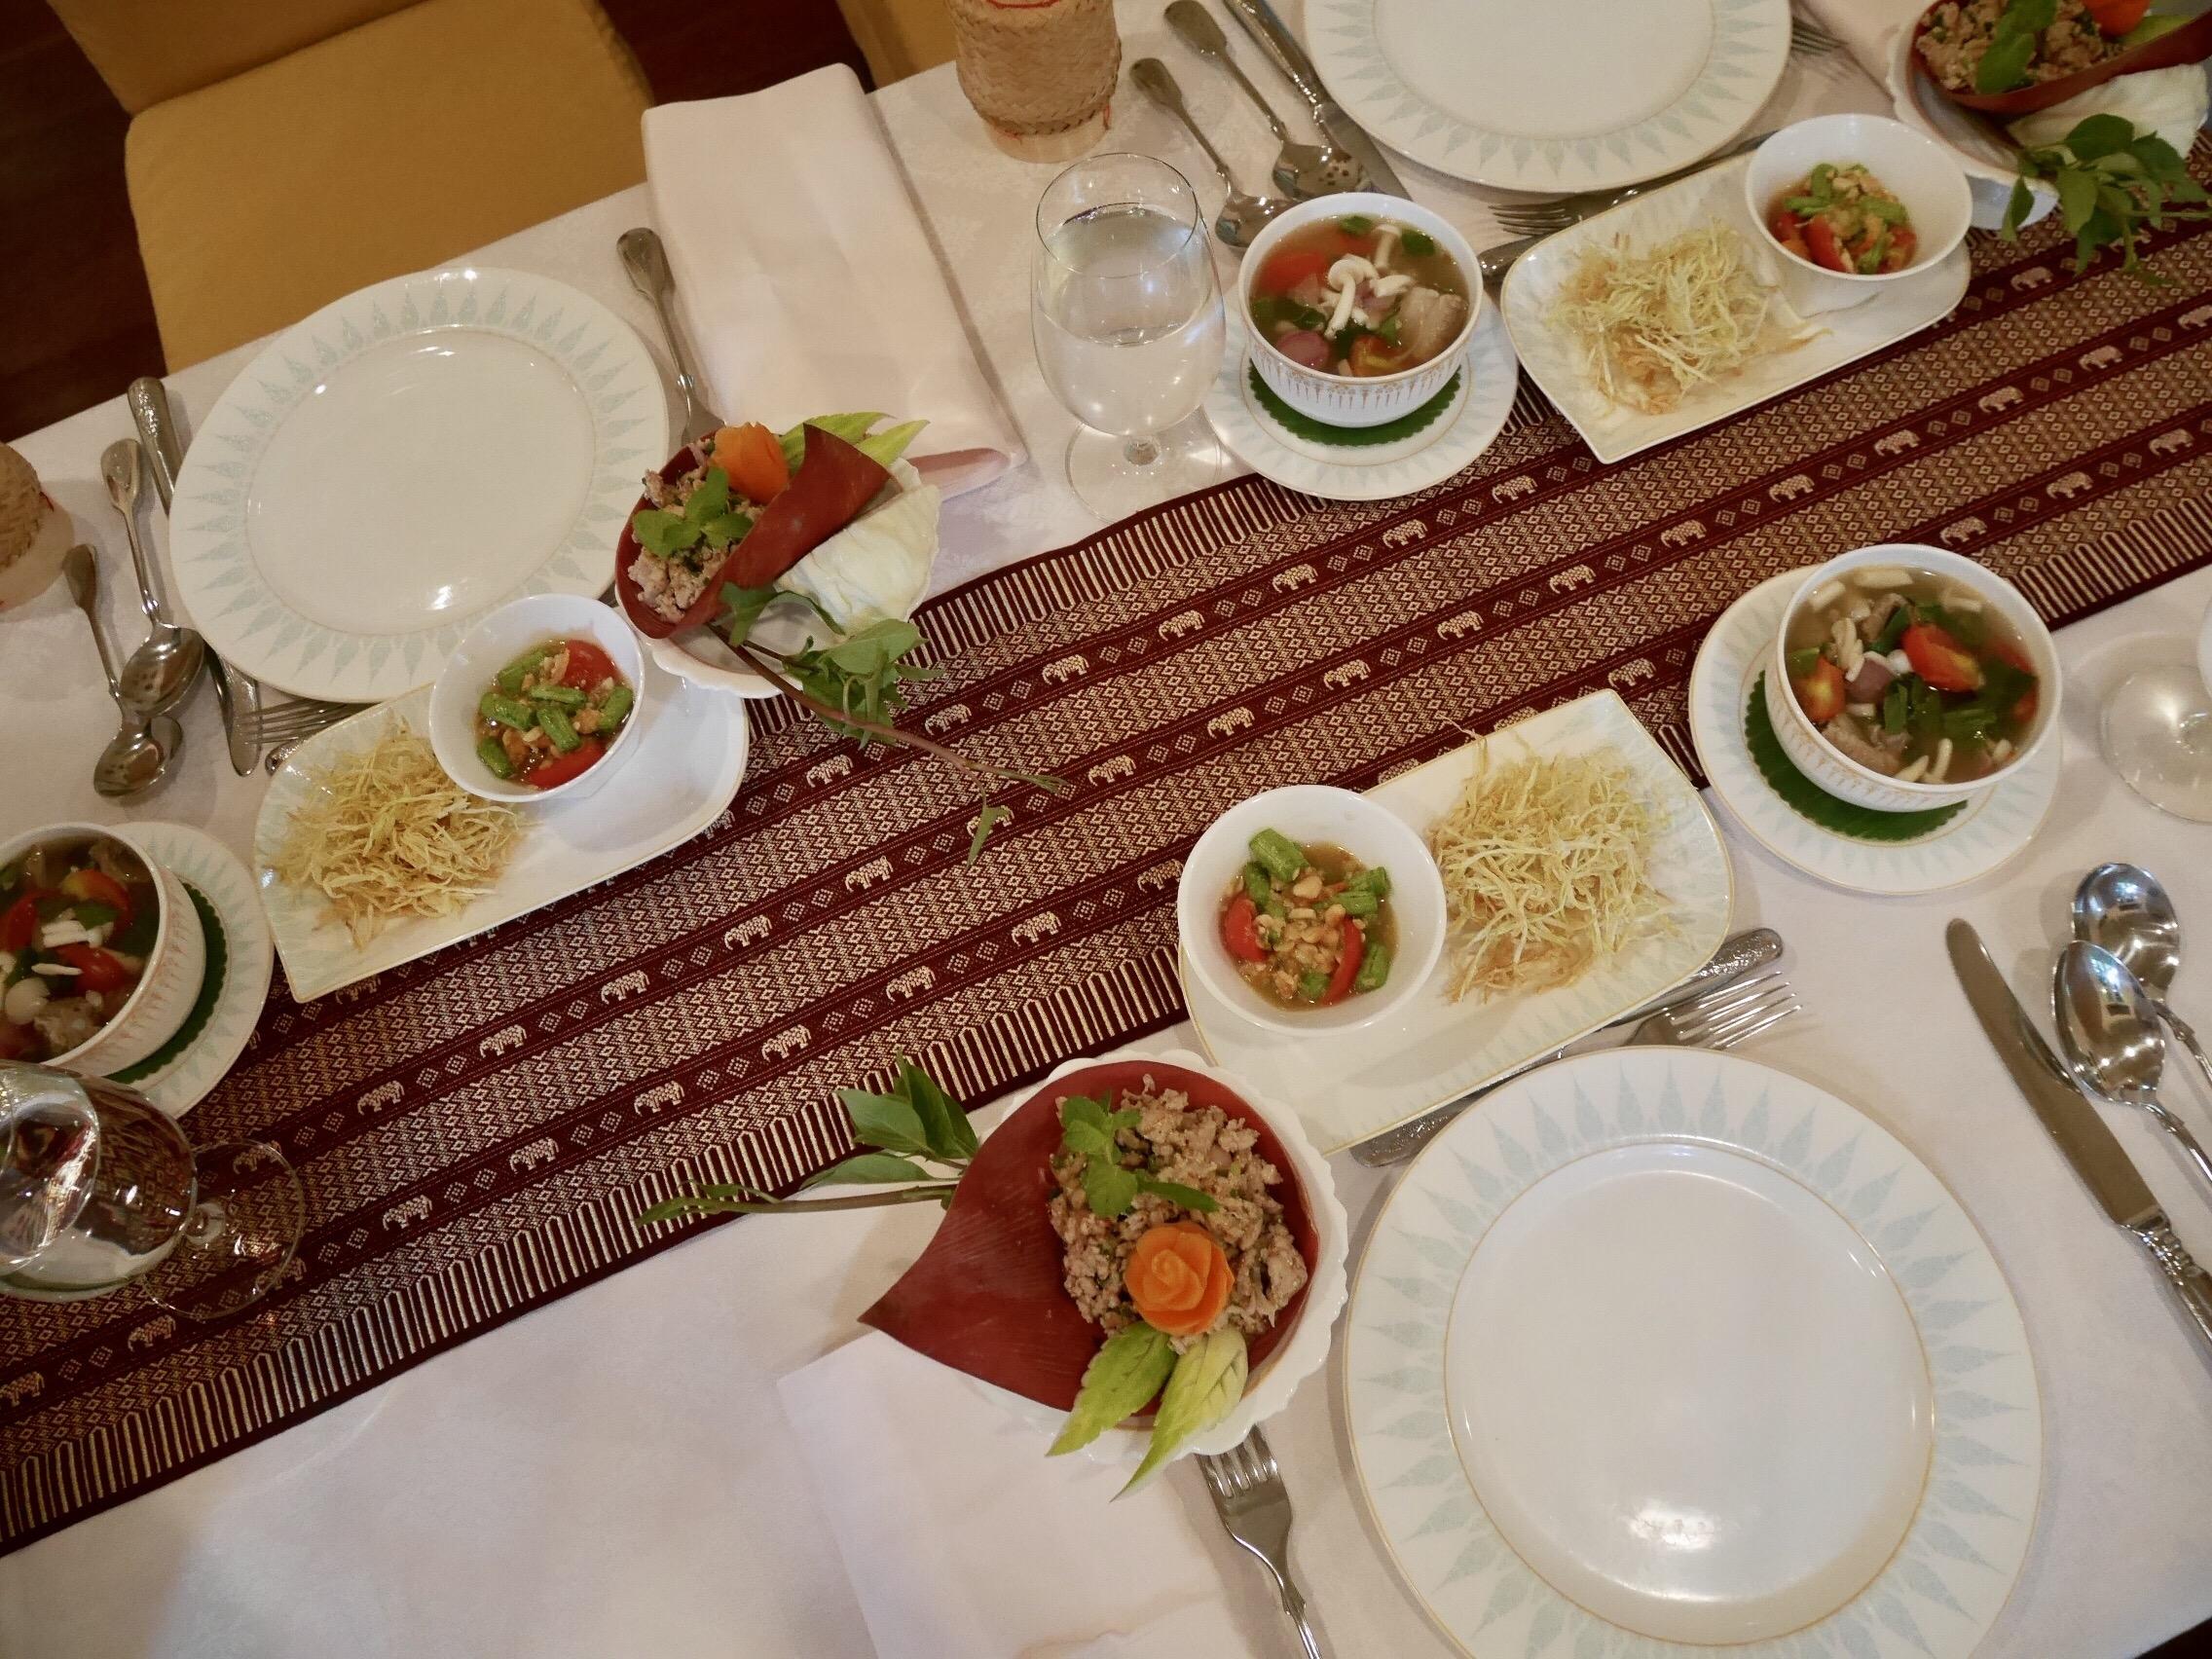 img 9040 - The Oriental Thai Cooking School - マンダリンオリエンタルバンコクのおもてなし空間で体験する絶品タイ料理教室